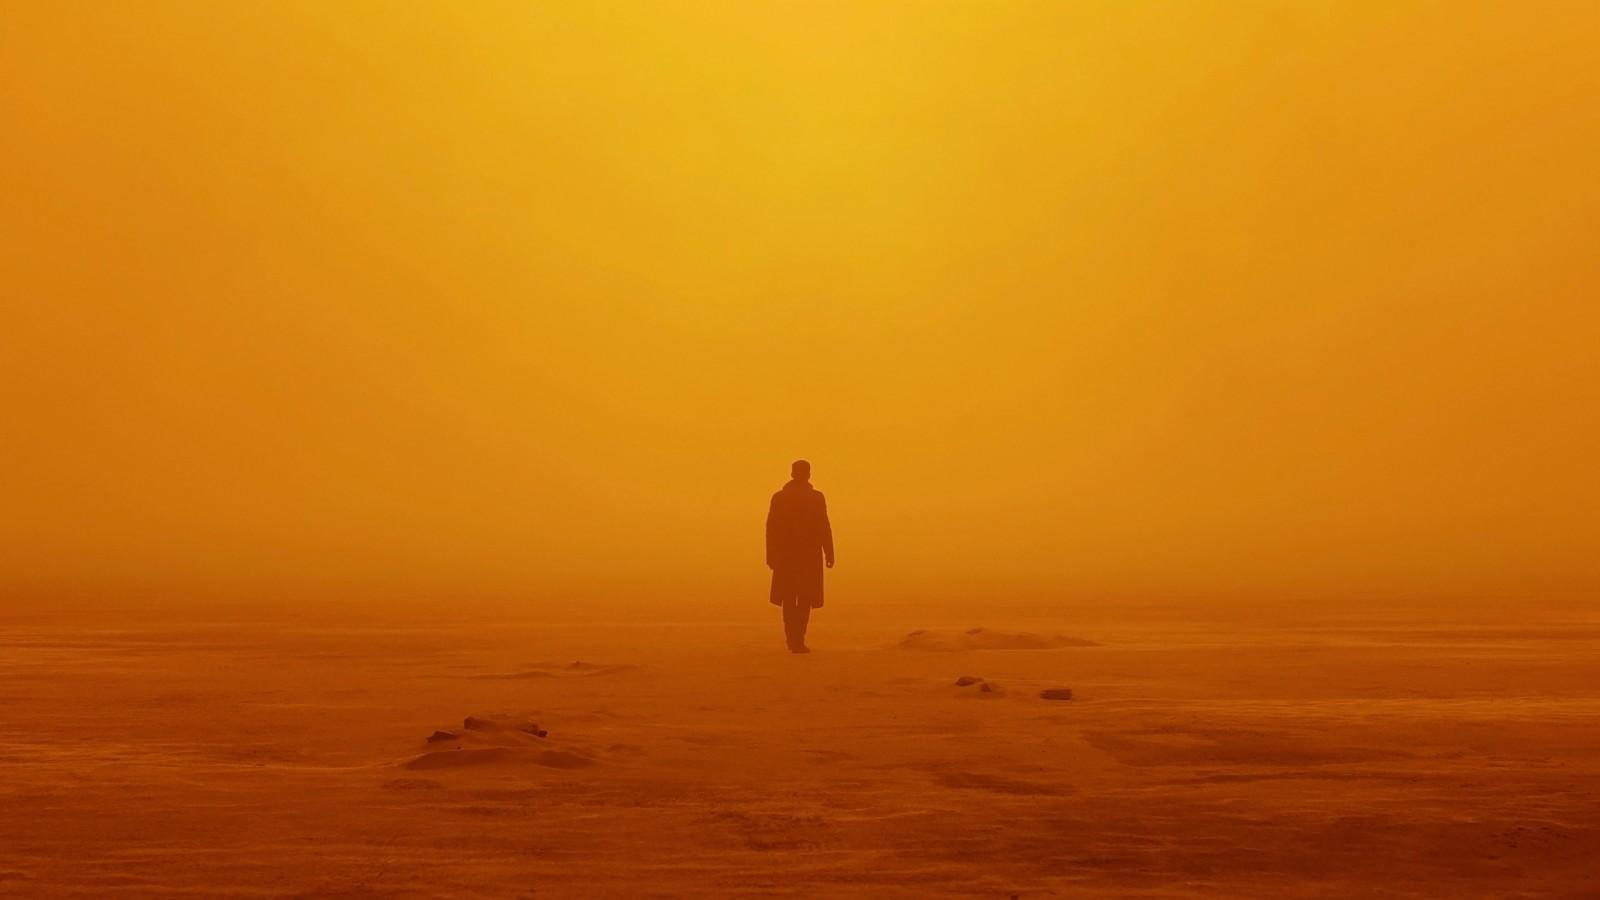 Iphone Hd Wallpapers 1080p Officer K Blade Runner 2049 Wallpapers Hd Wallpapers